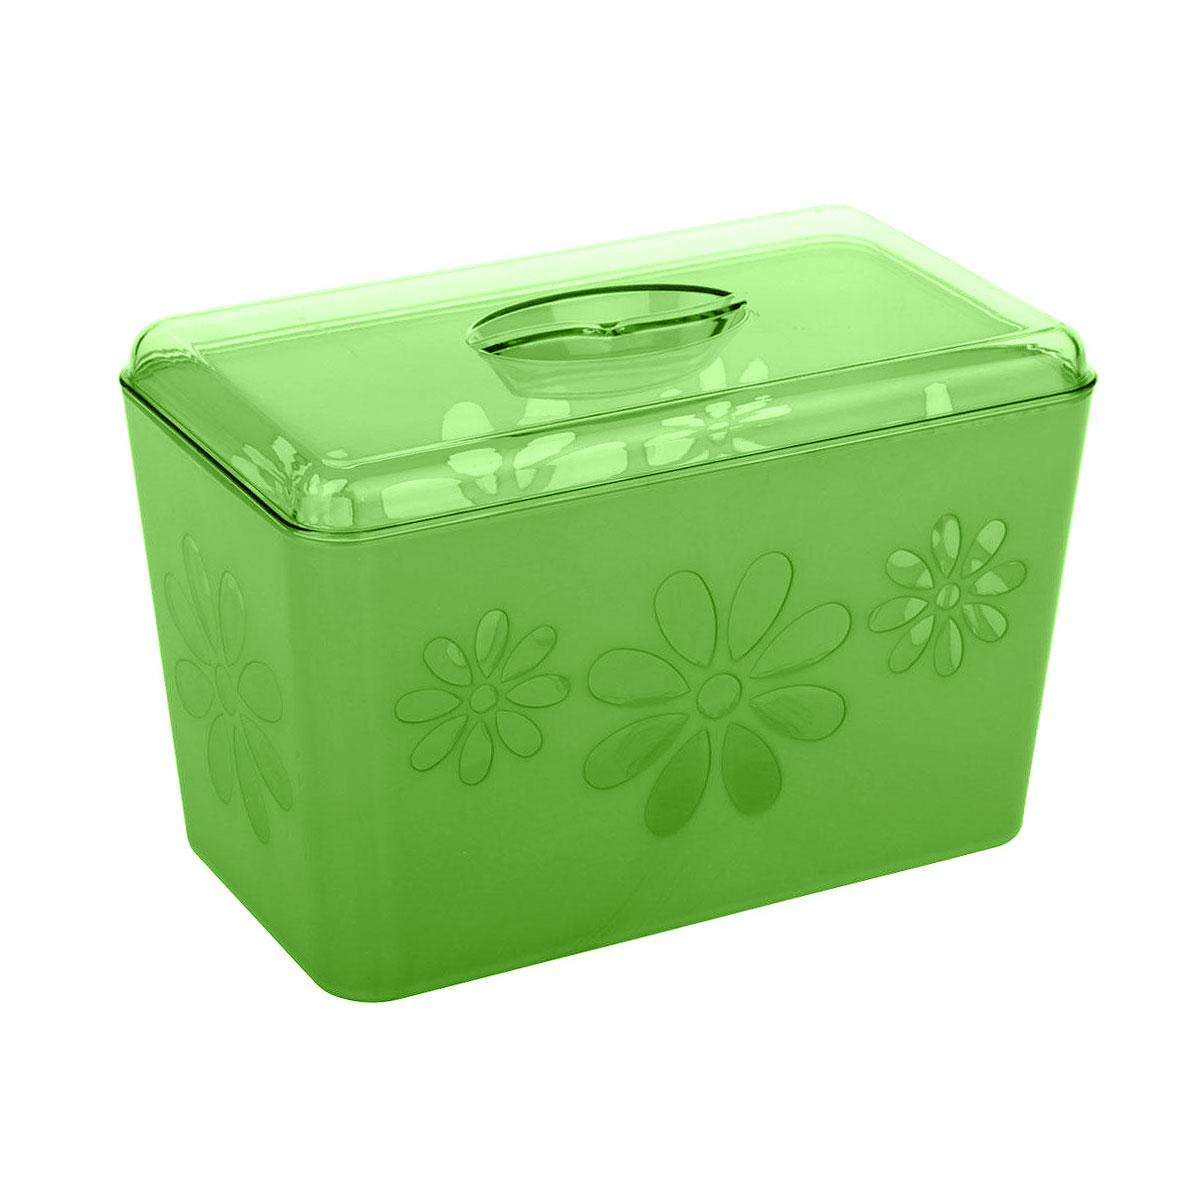 "Хлебница Альтернатива ""Соблазн"", цвет: зеленый, 24 см х 14 см х 14,5 см"